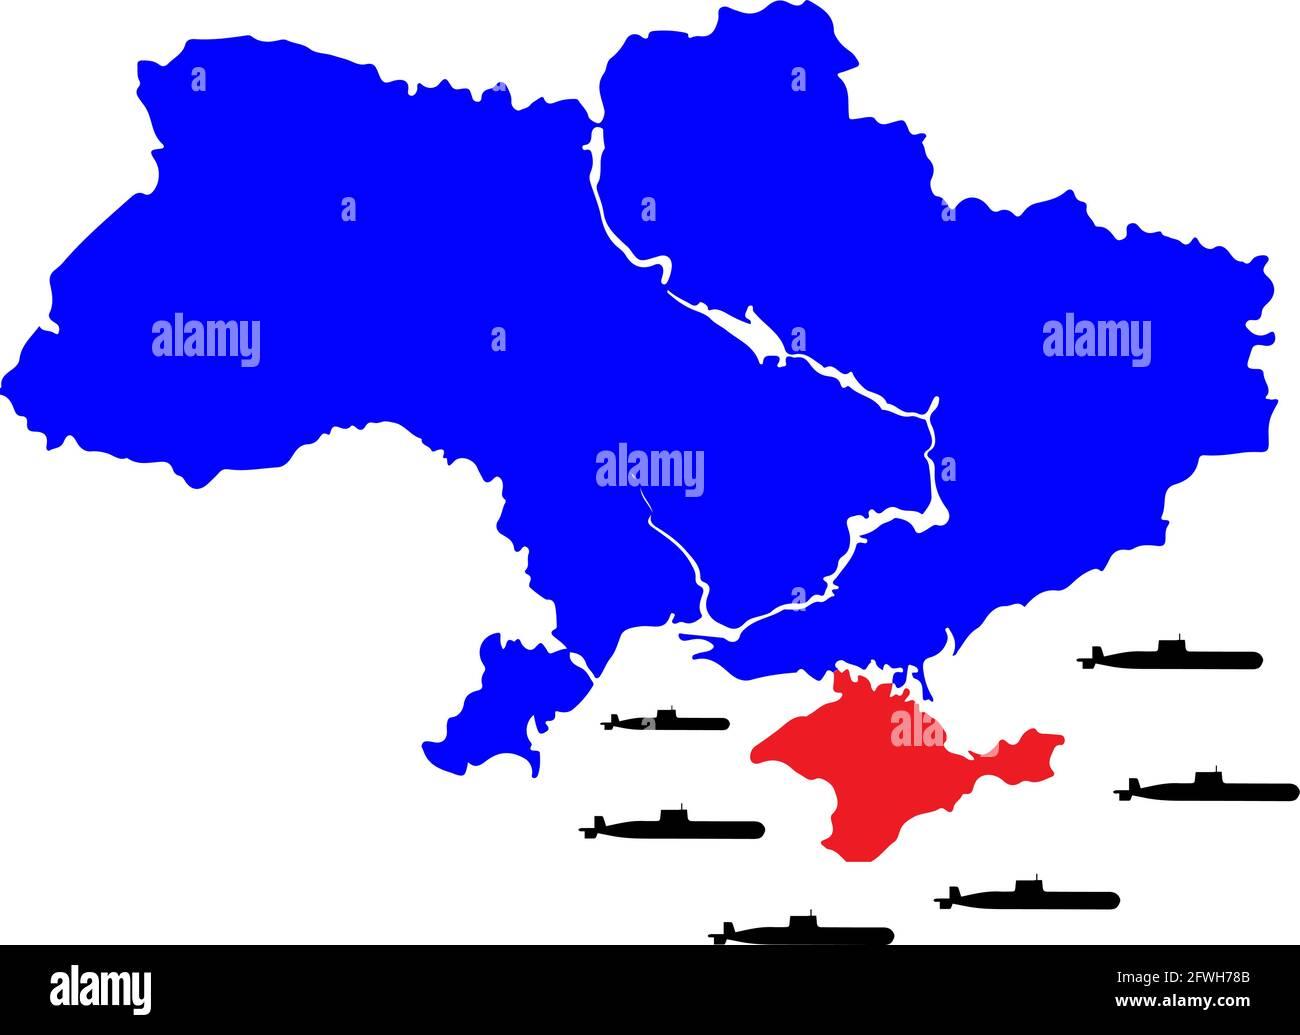 Cartina Muta Ucraina.Ukraine Russia Map Immagini E Fotos Stock Alamy